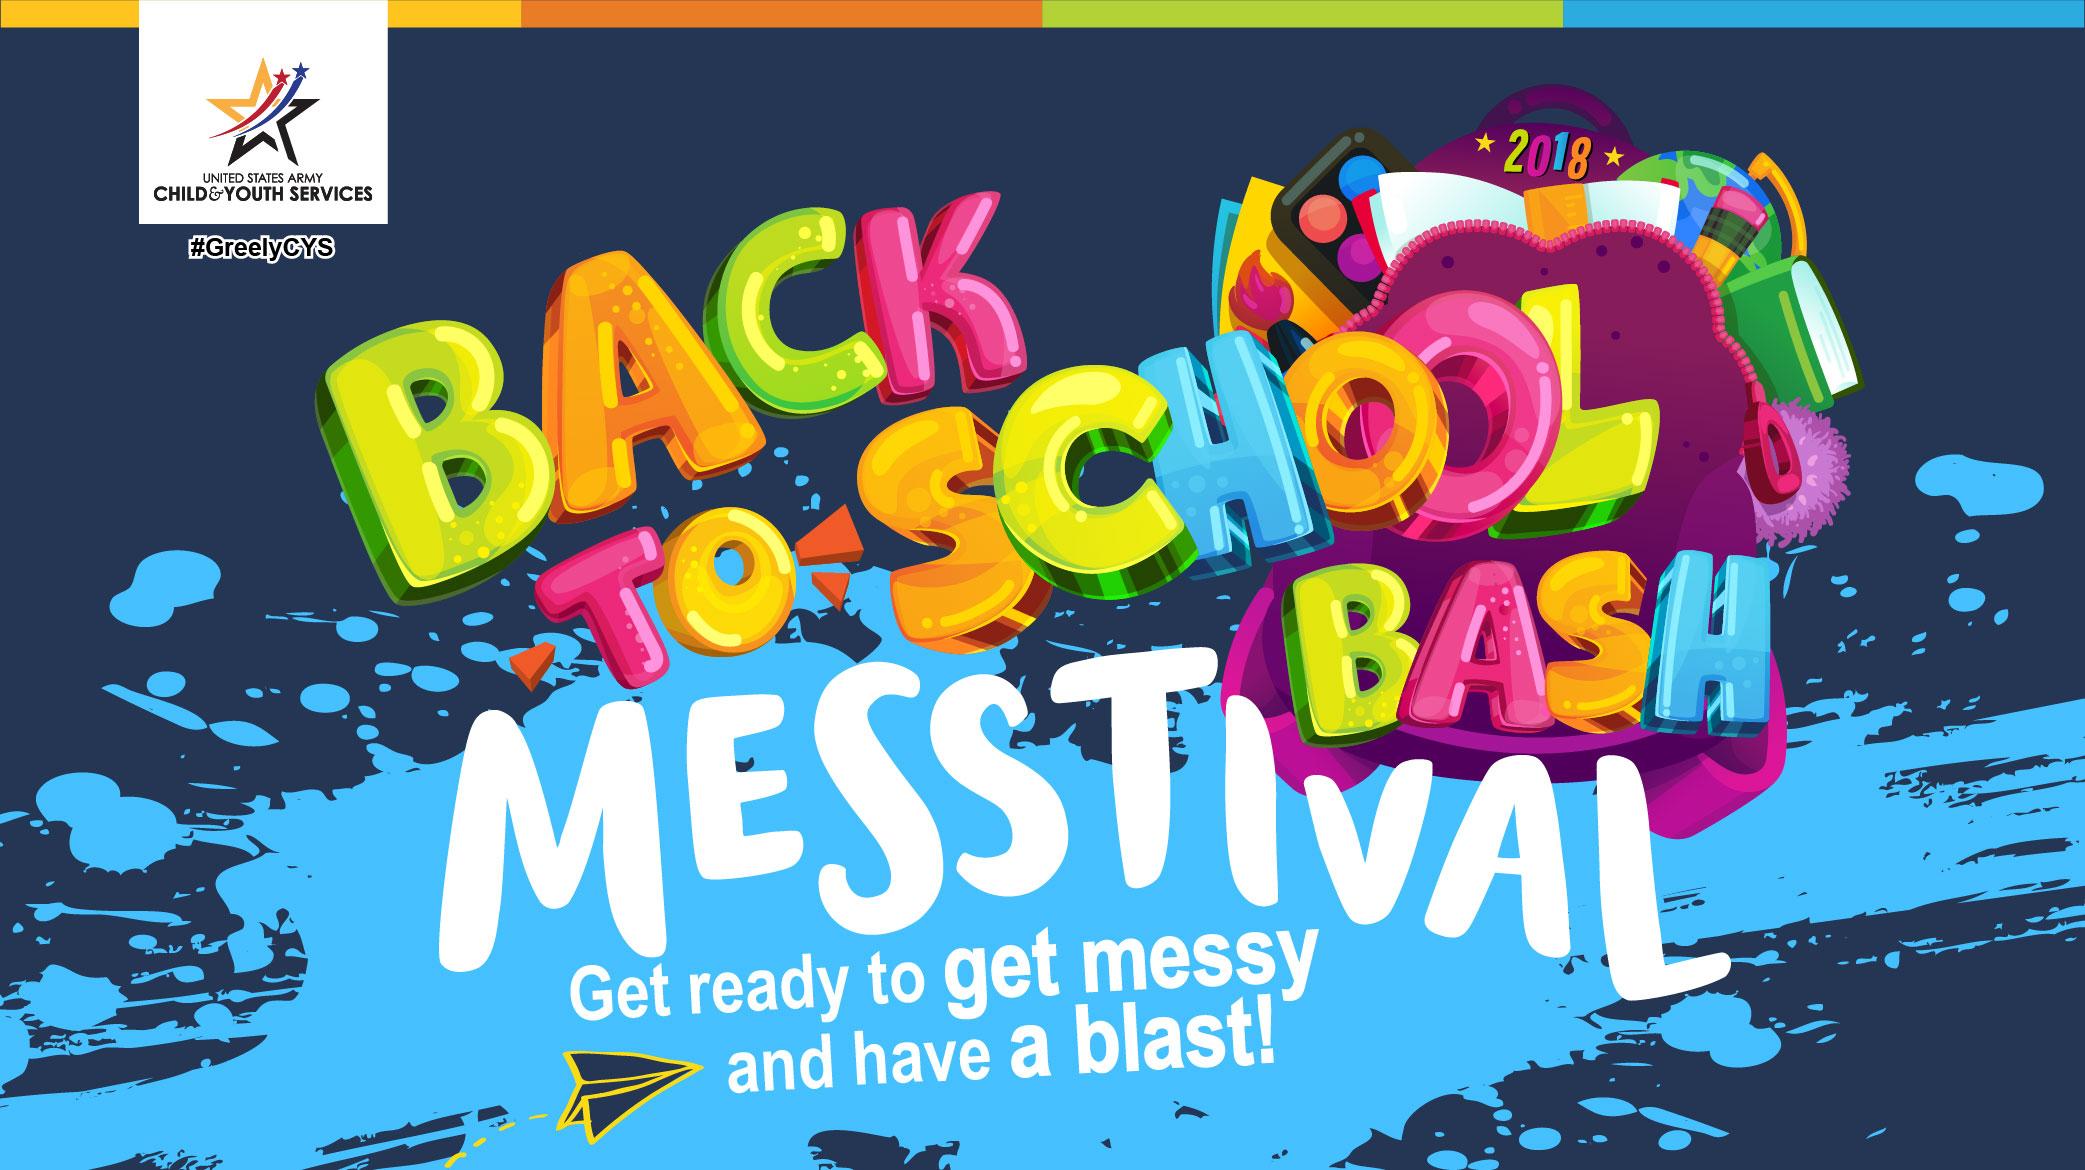 Back to School Bash Messtival